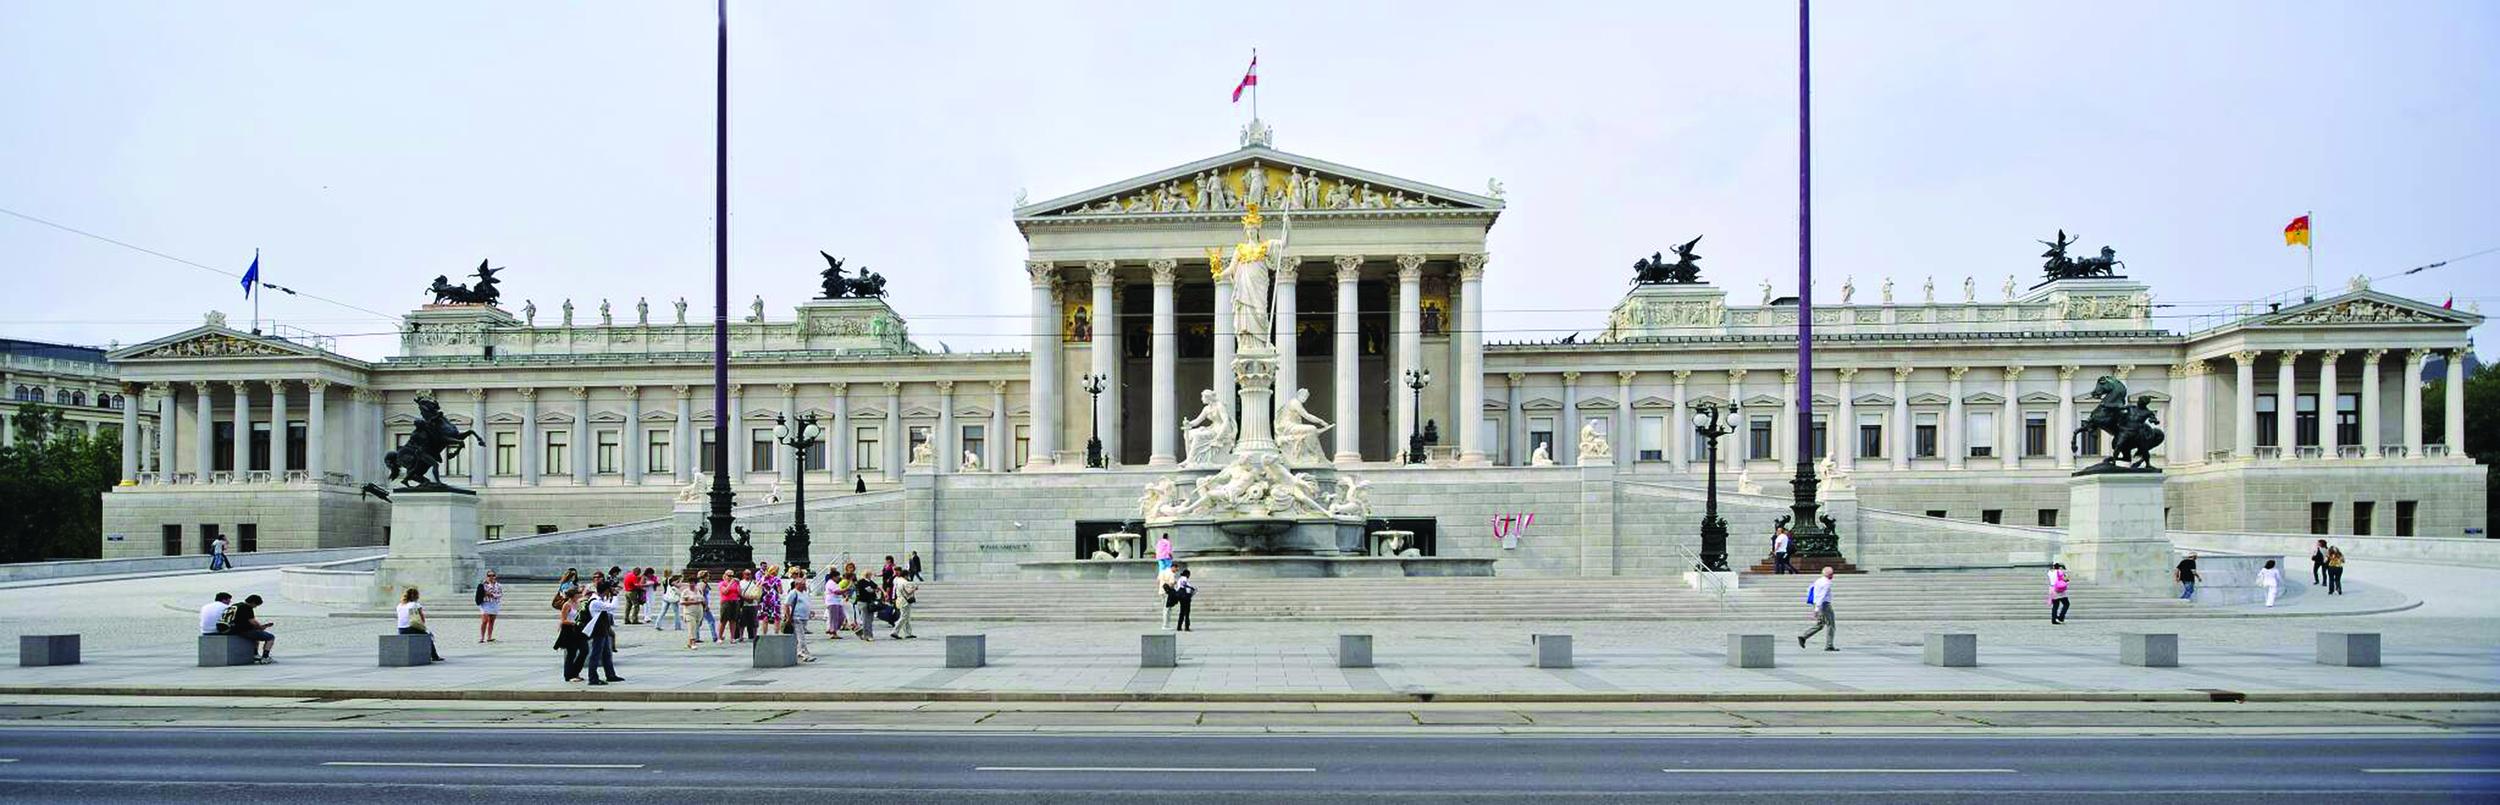 Parlament Panorama-Stadt-Wien-Schaub-Walzer-PID_p16.jpg